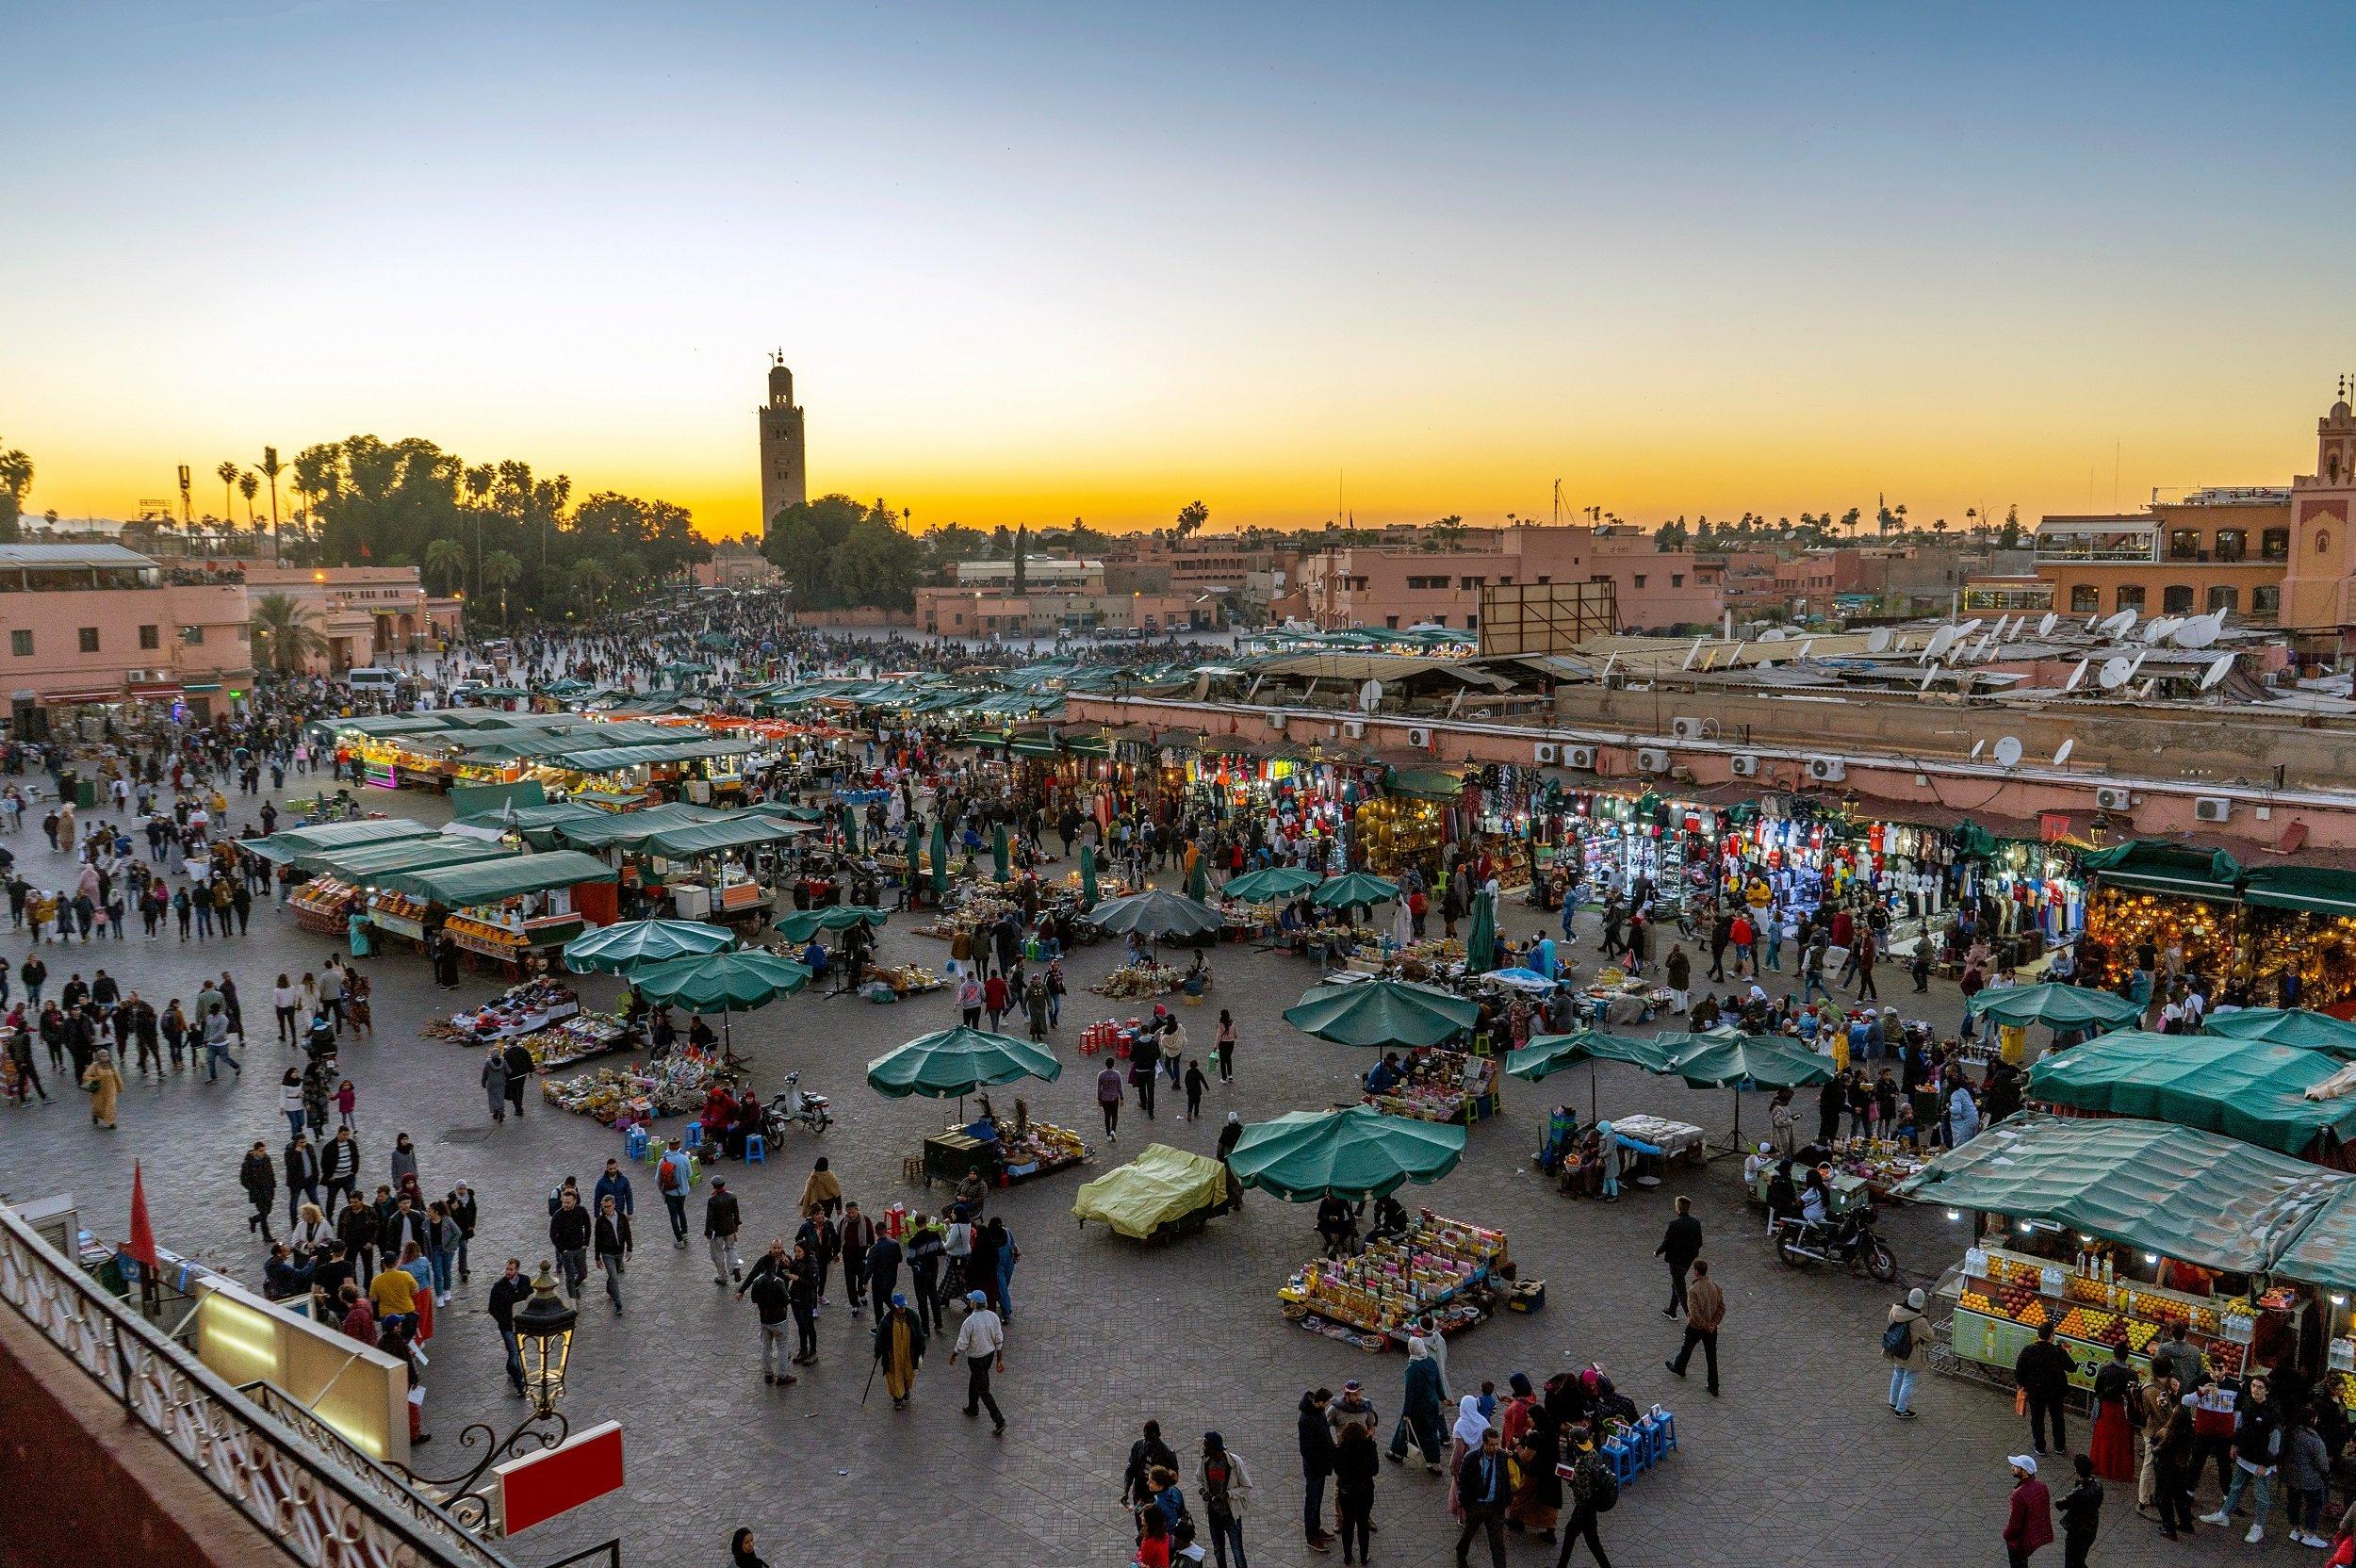 Marrakesh 4 Day City Break Tour Package